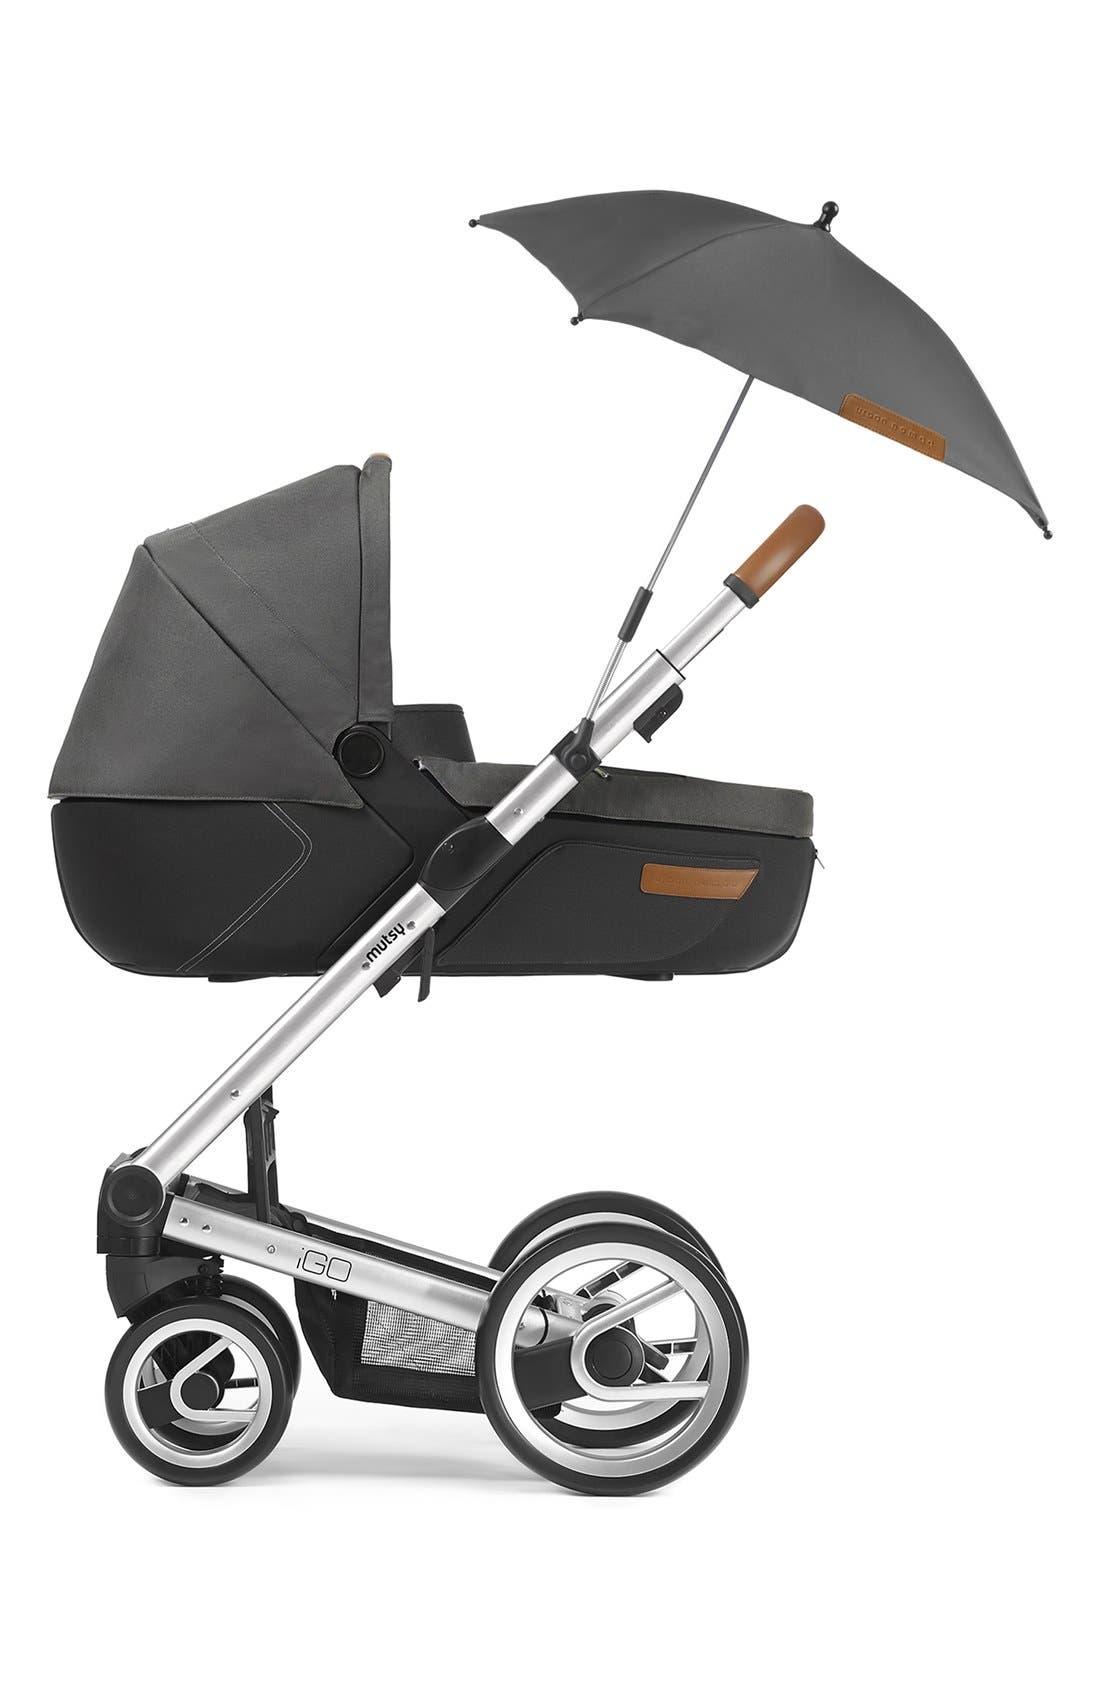 'Igo - Pure Fog' Stroller Umbrella,                             Alternate thumbnail 2, color,                             020